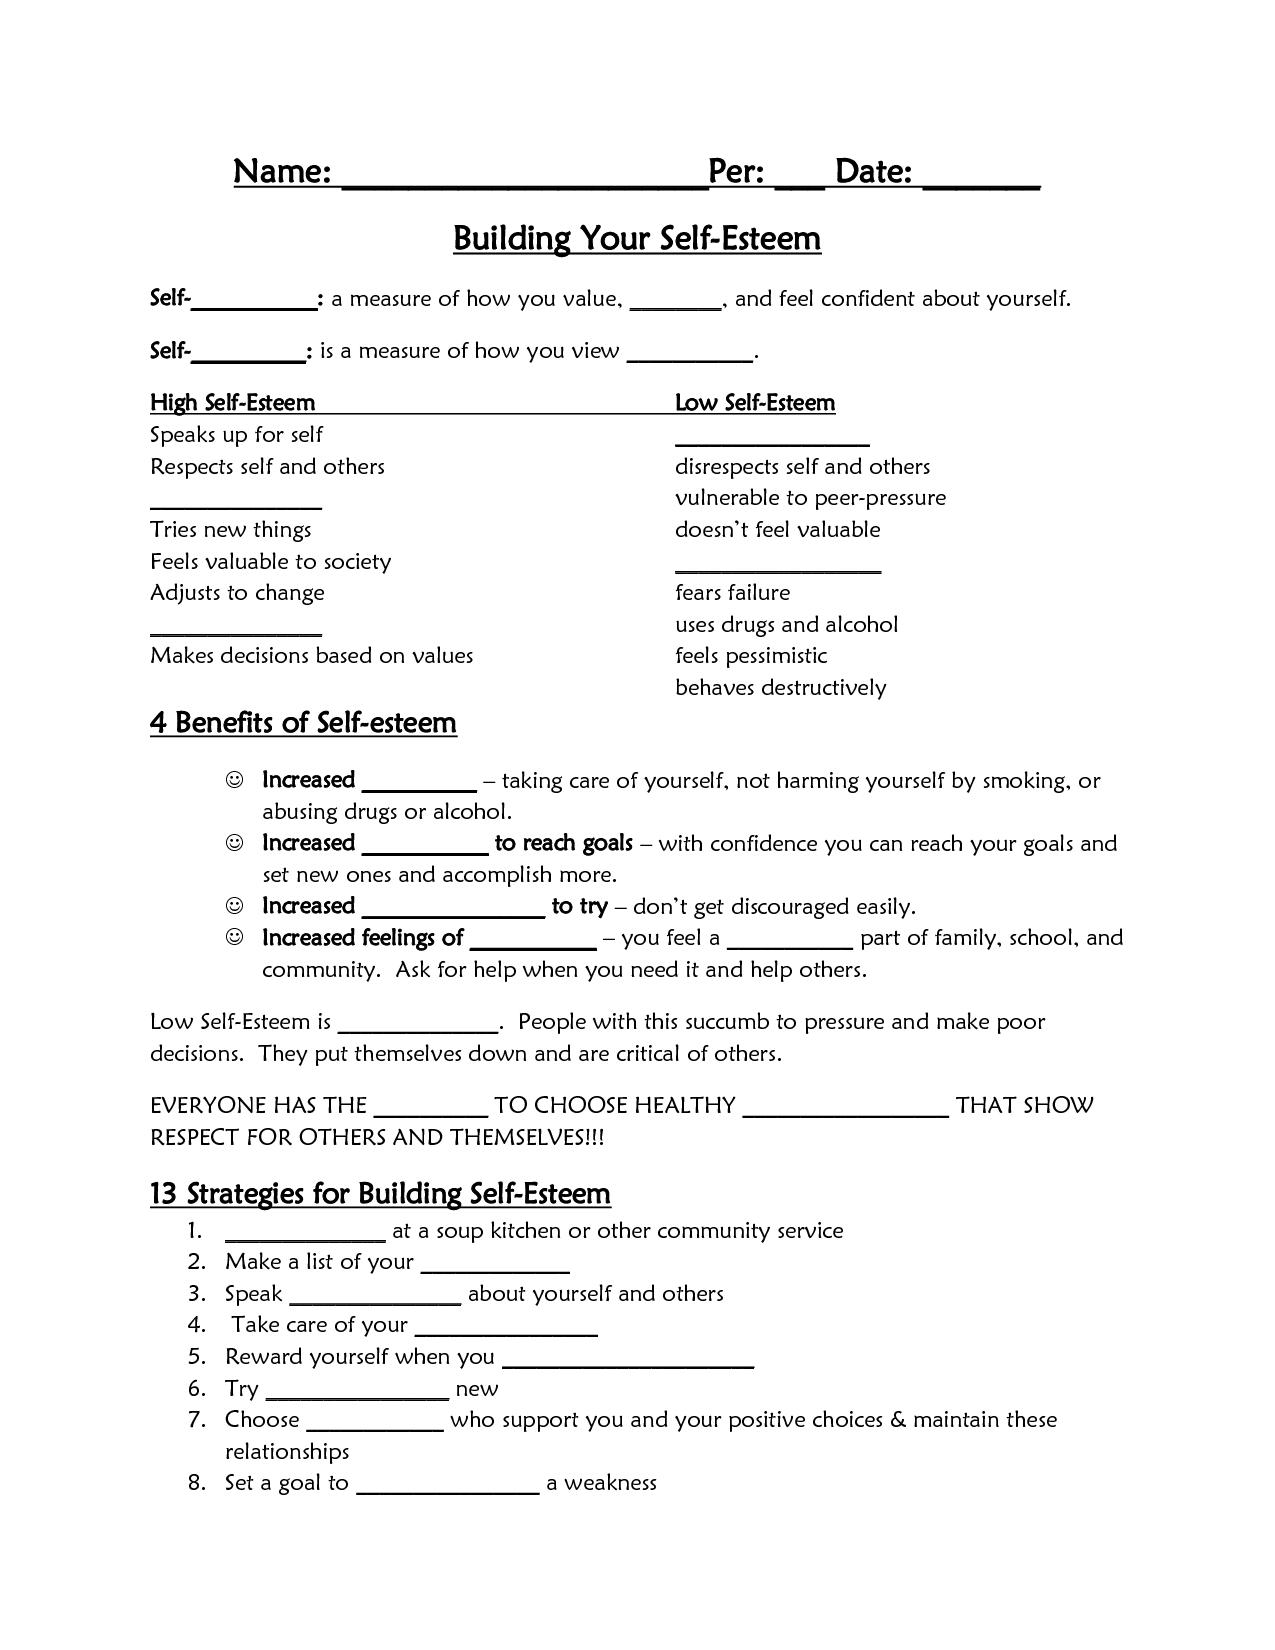 Self-Esteem Worksheet - Google Search | Self Esteem